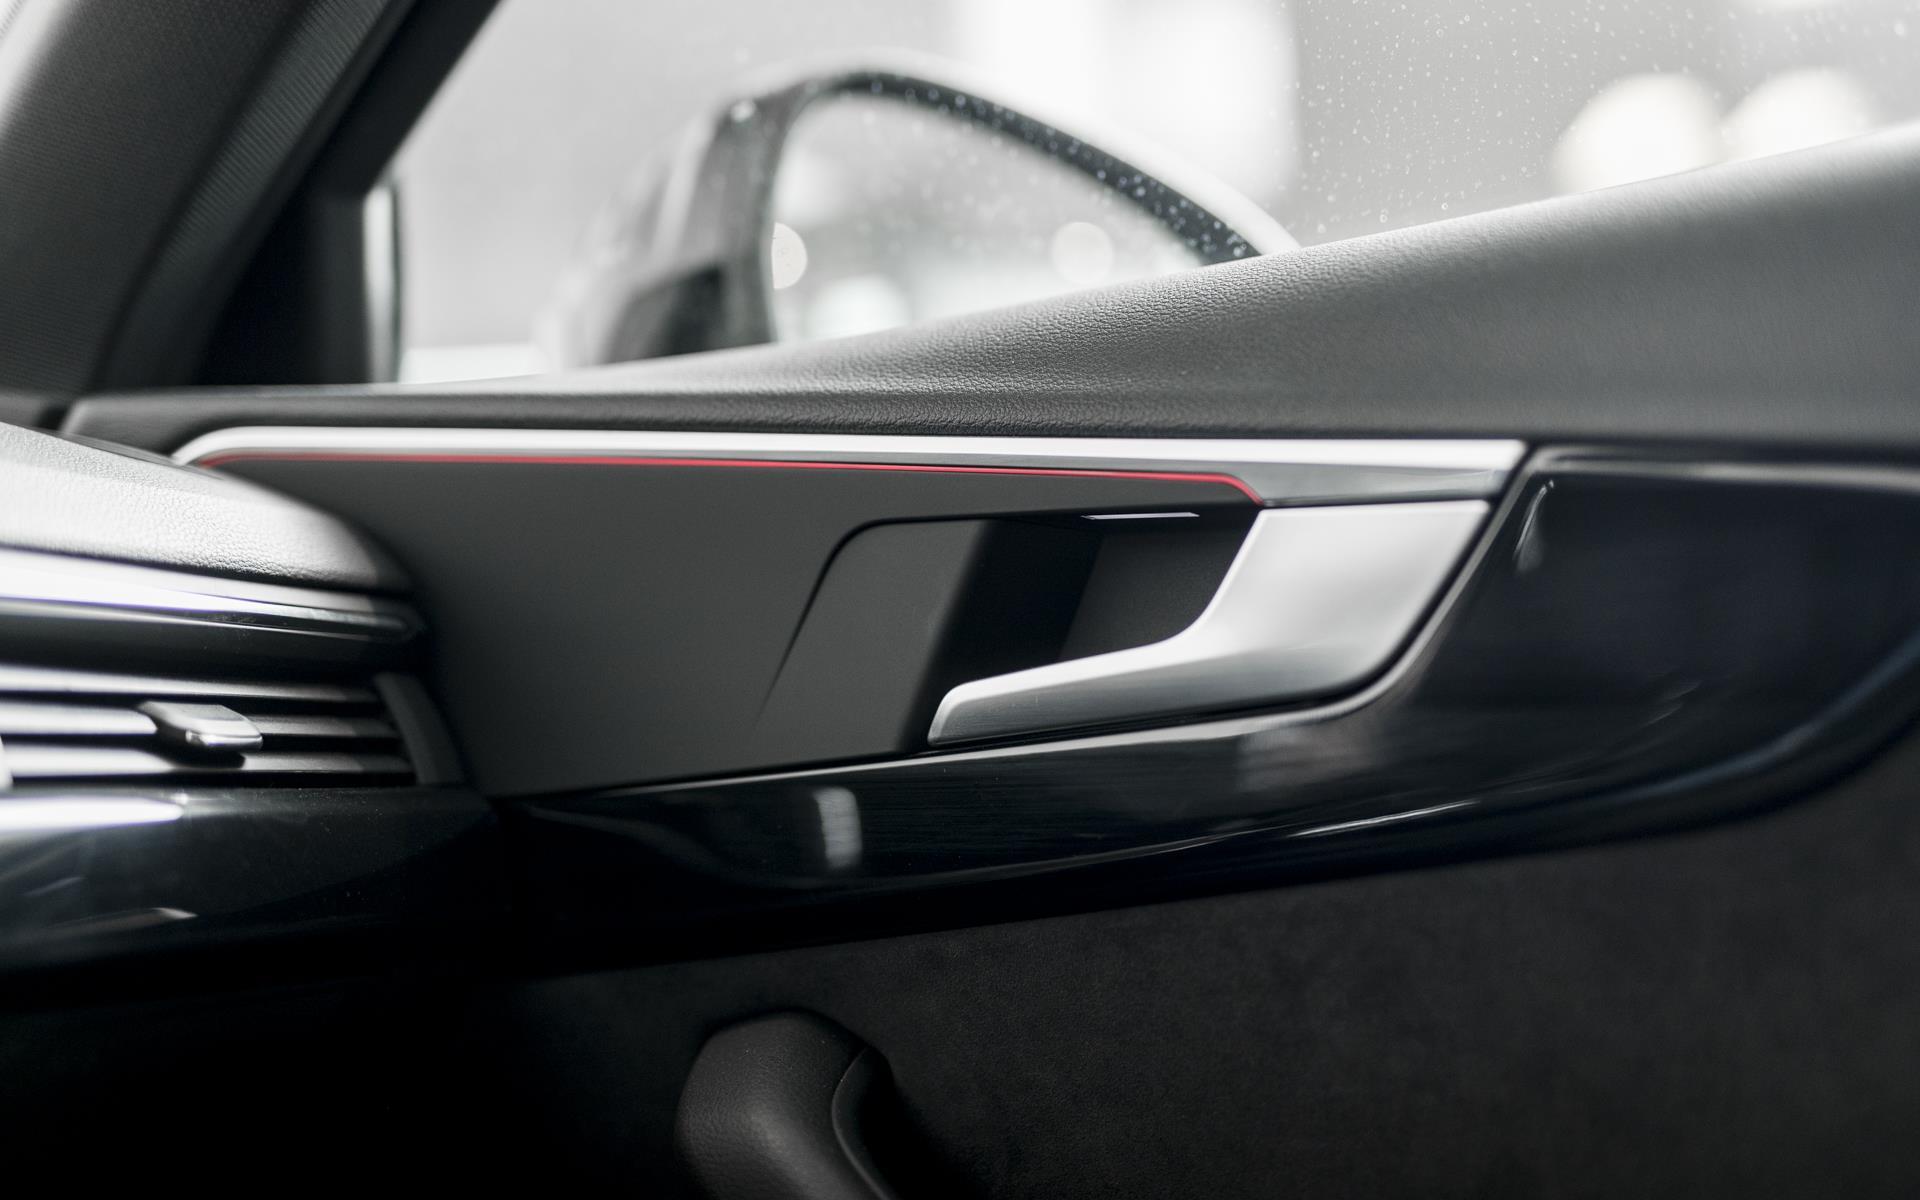 Avant 2,0 TDI S-Line Black Edition TipTronic 190HK Stc  image17